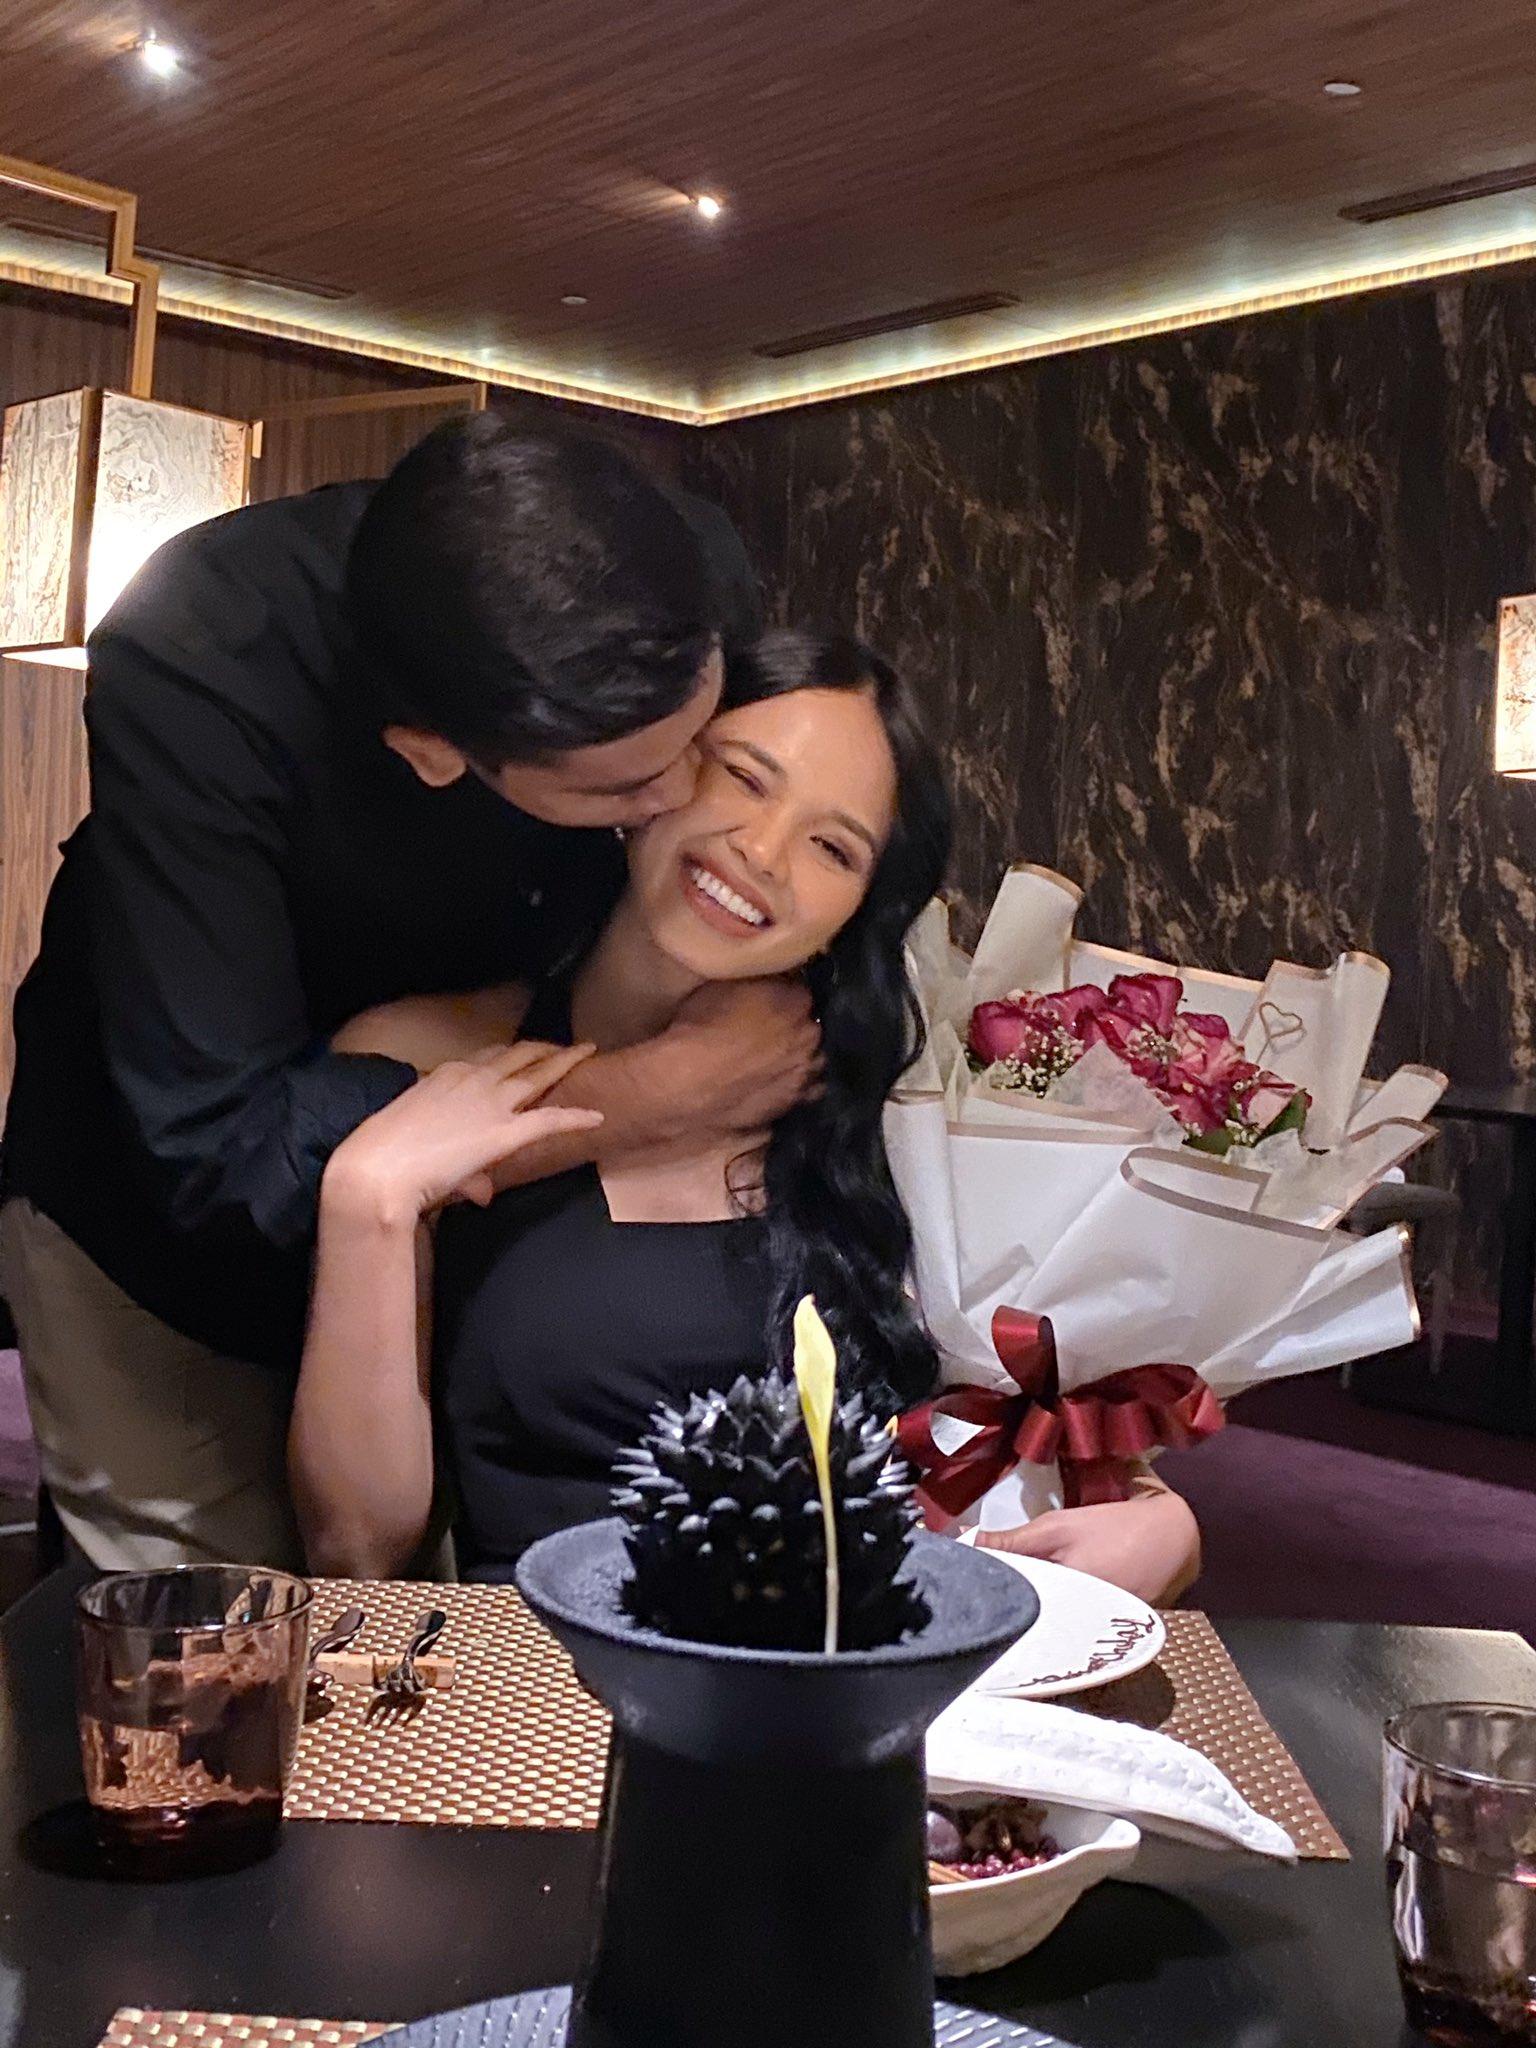 Kongsi Gambar Dicium Suami, Ain Edruce Buntu Dikecam Netizen